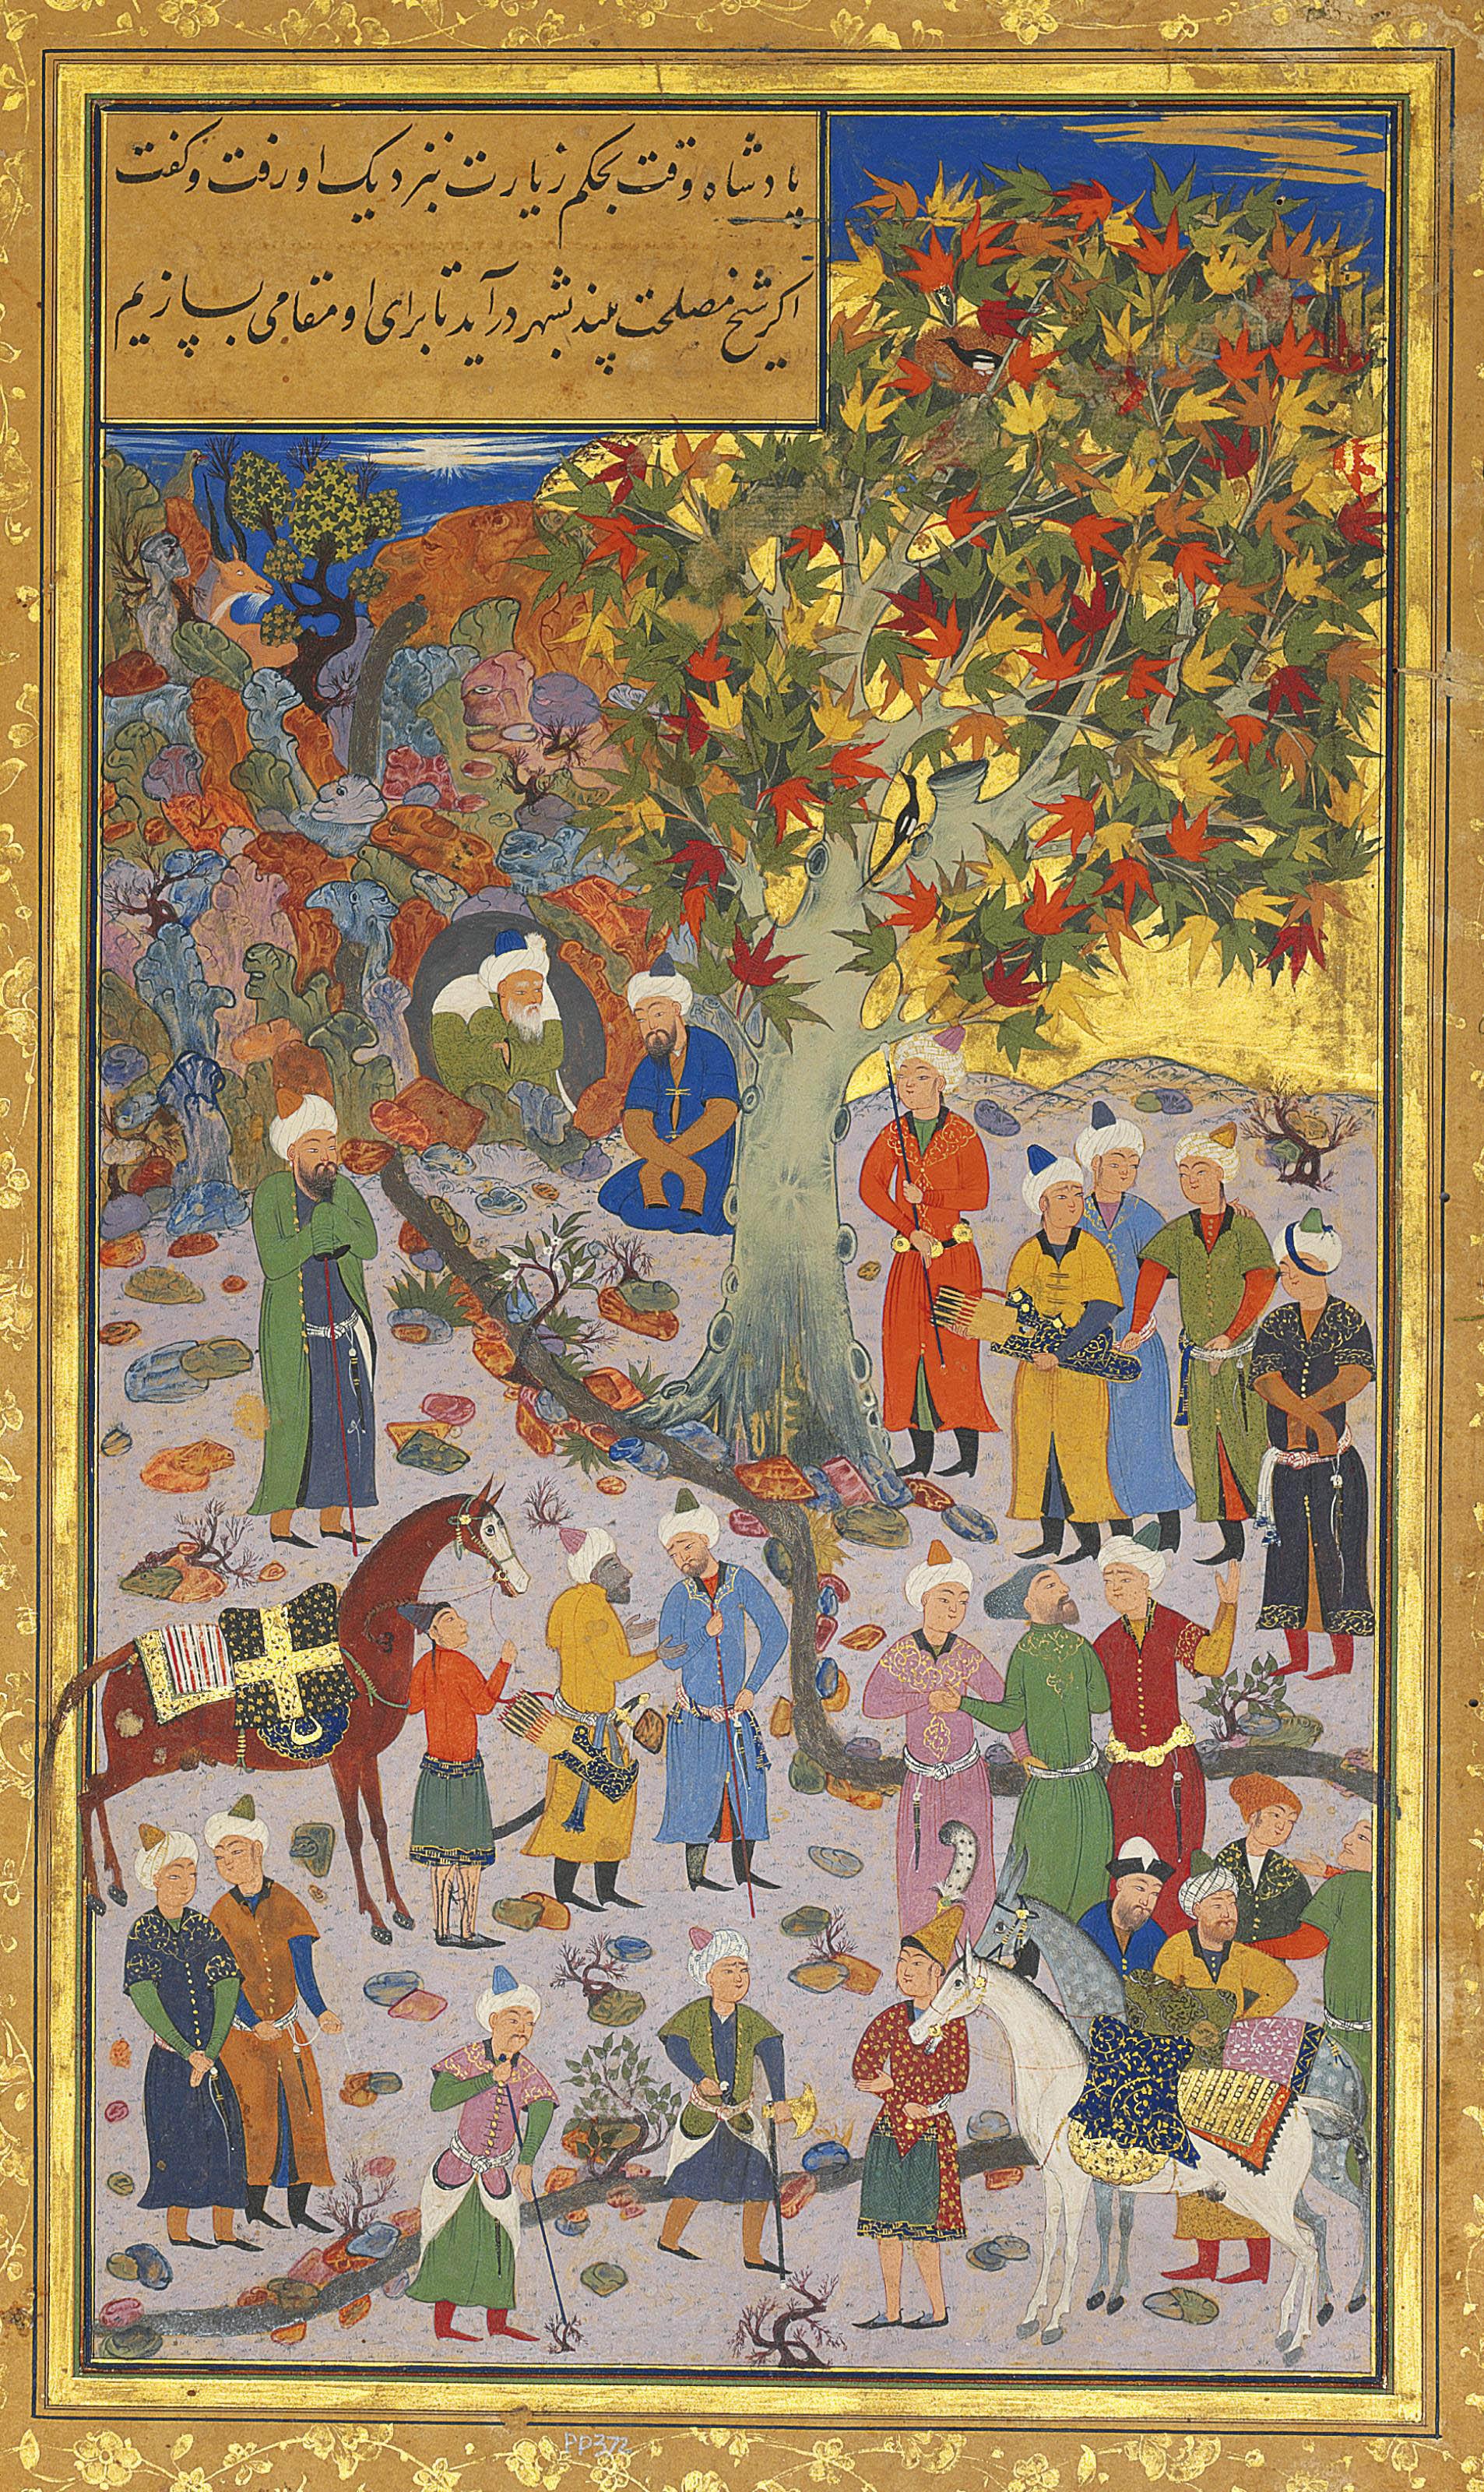 VISIT TO A DERVISH SIGNED MAHMUD MUZAHHIB, BUKHARA, DATED AH 968 1560-61 AD